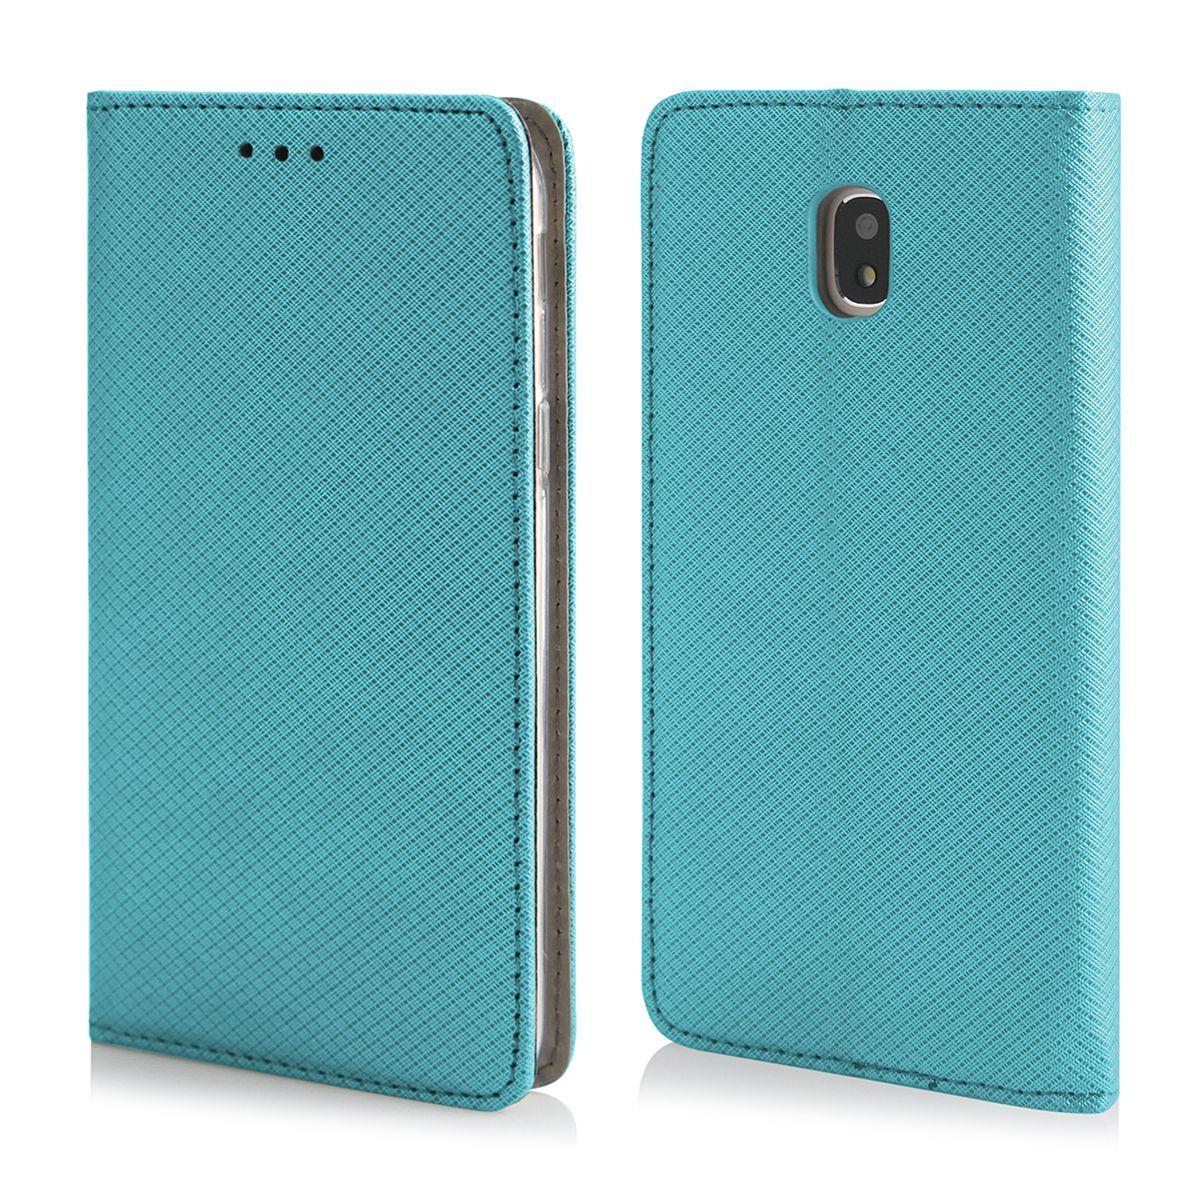 Pouzdro Sligo Smart na Samsung A20e - Power Magnet - tyrkysové Sligo Case